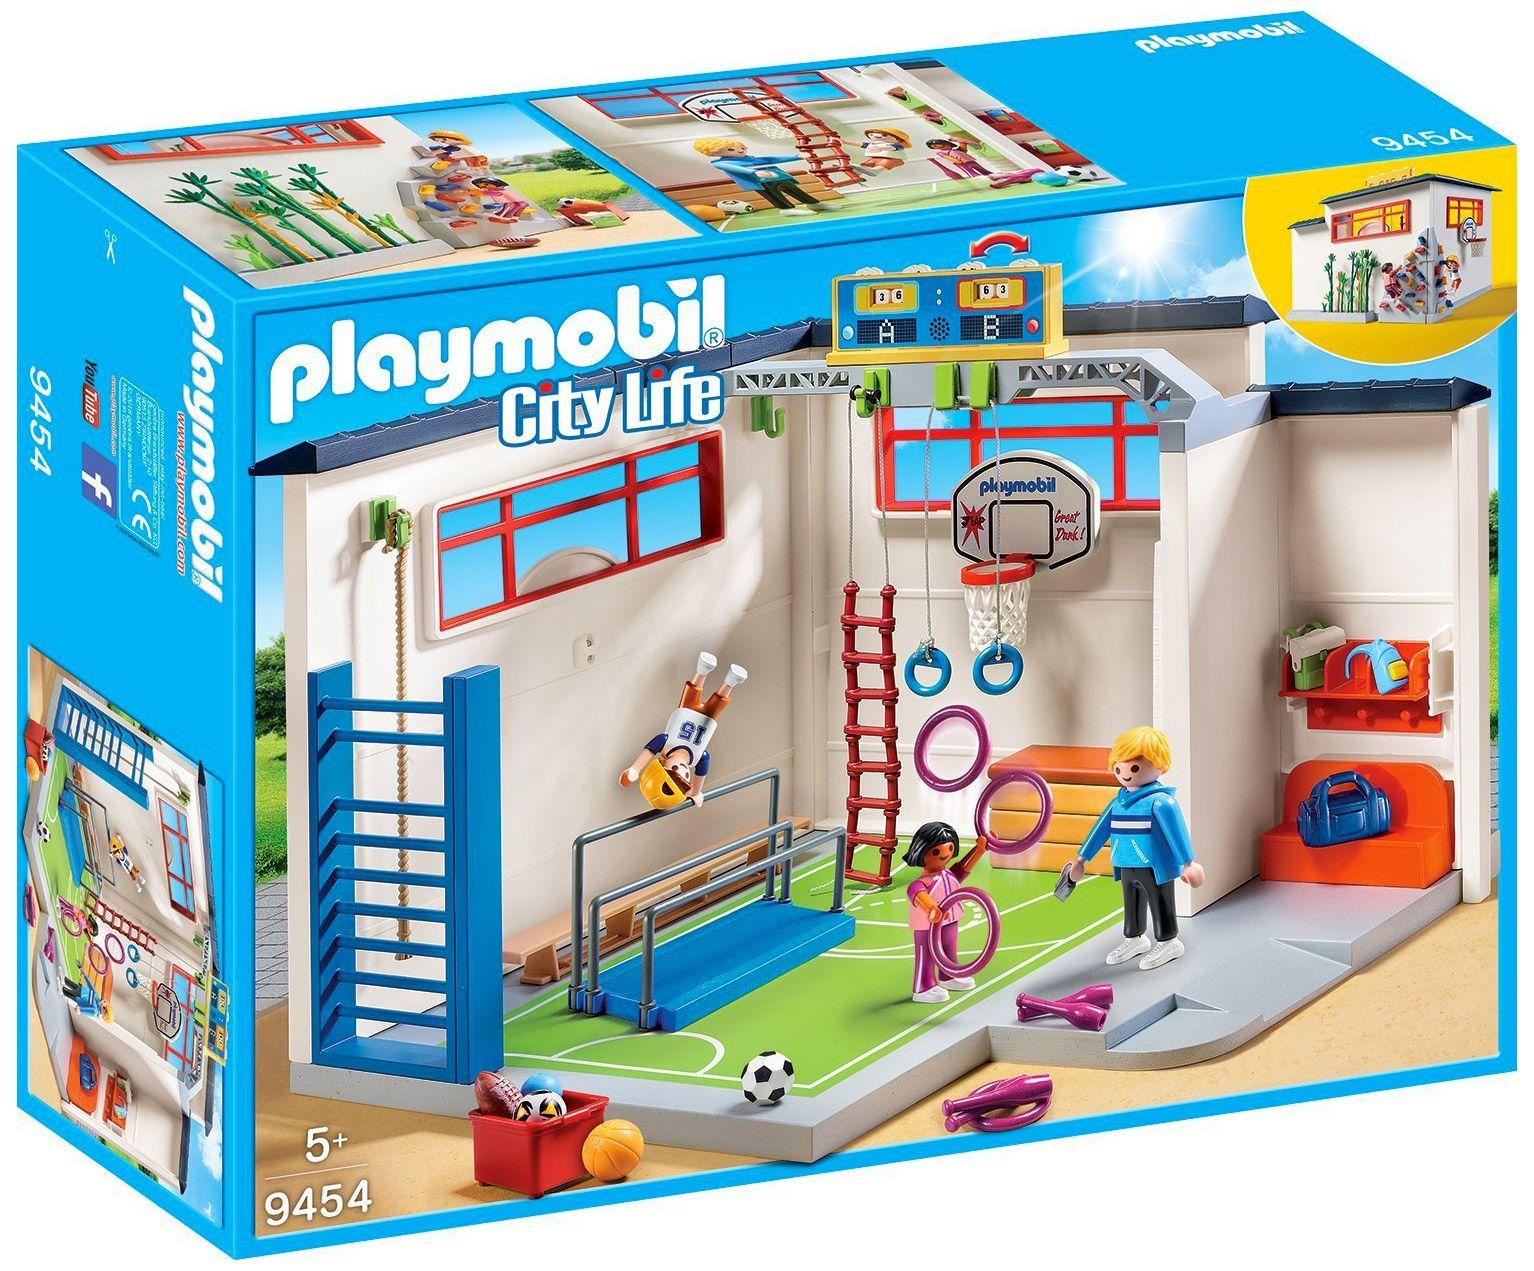 Playmobil City Life 9454 Pas Cher Salle De Sport Playmobil